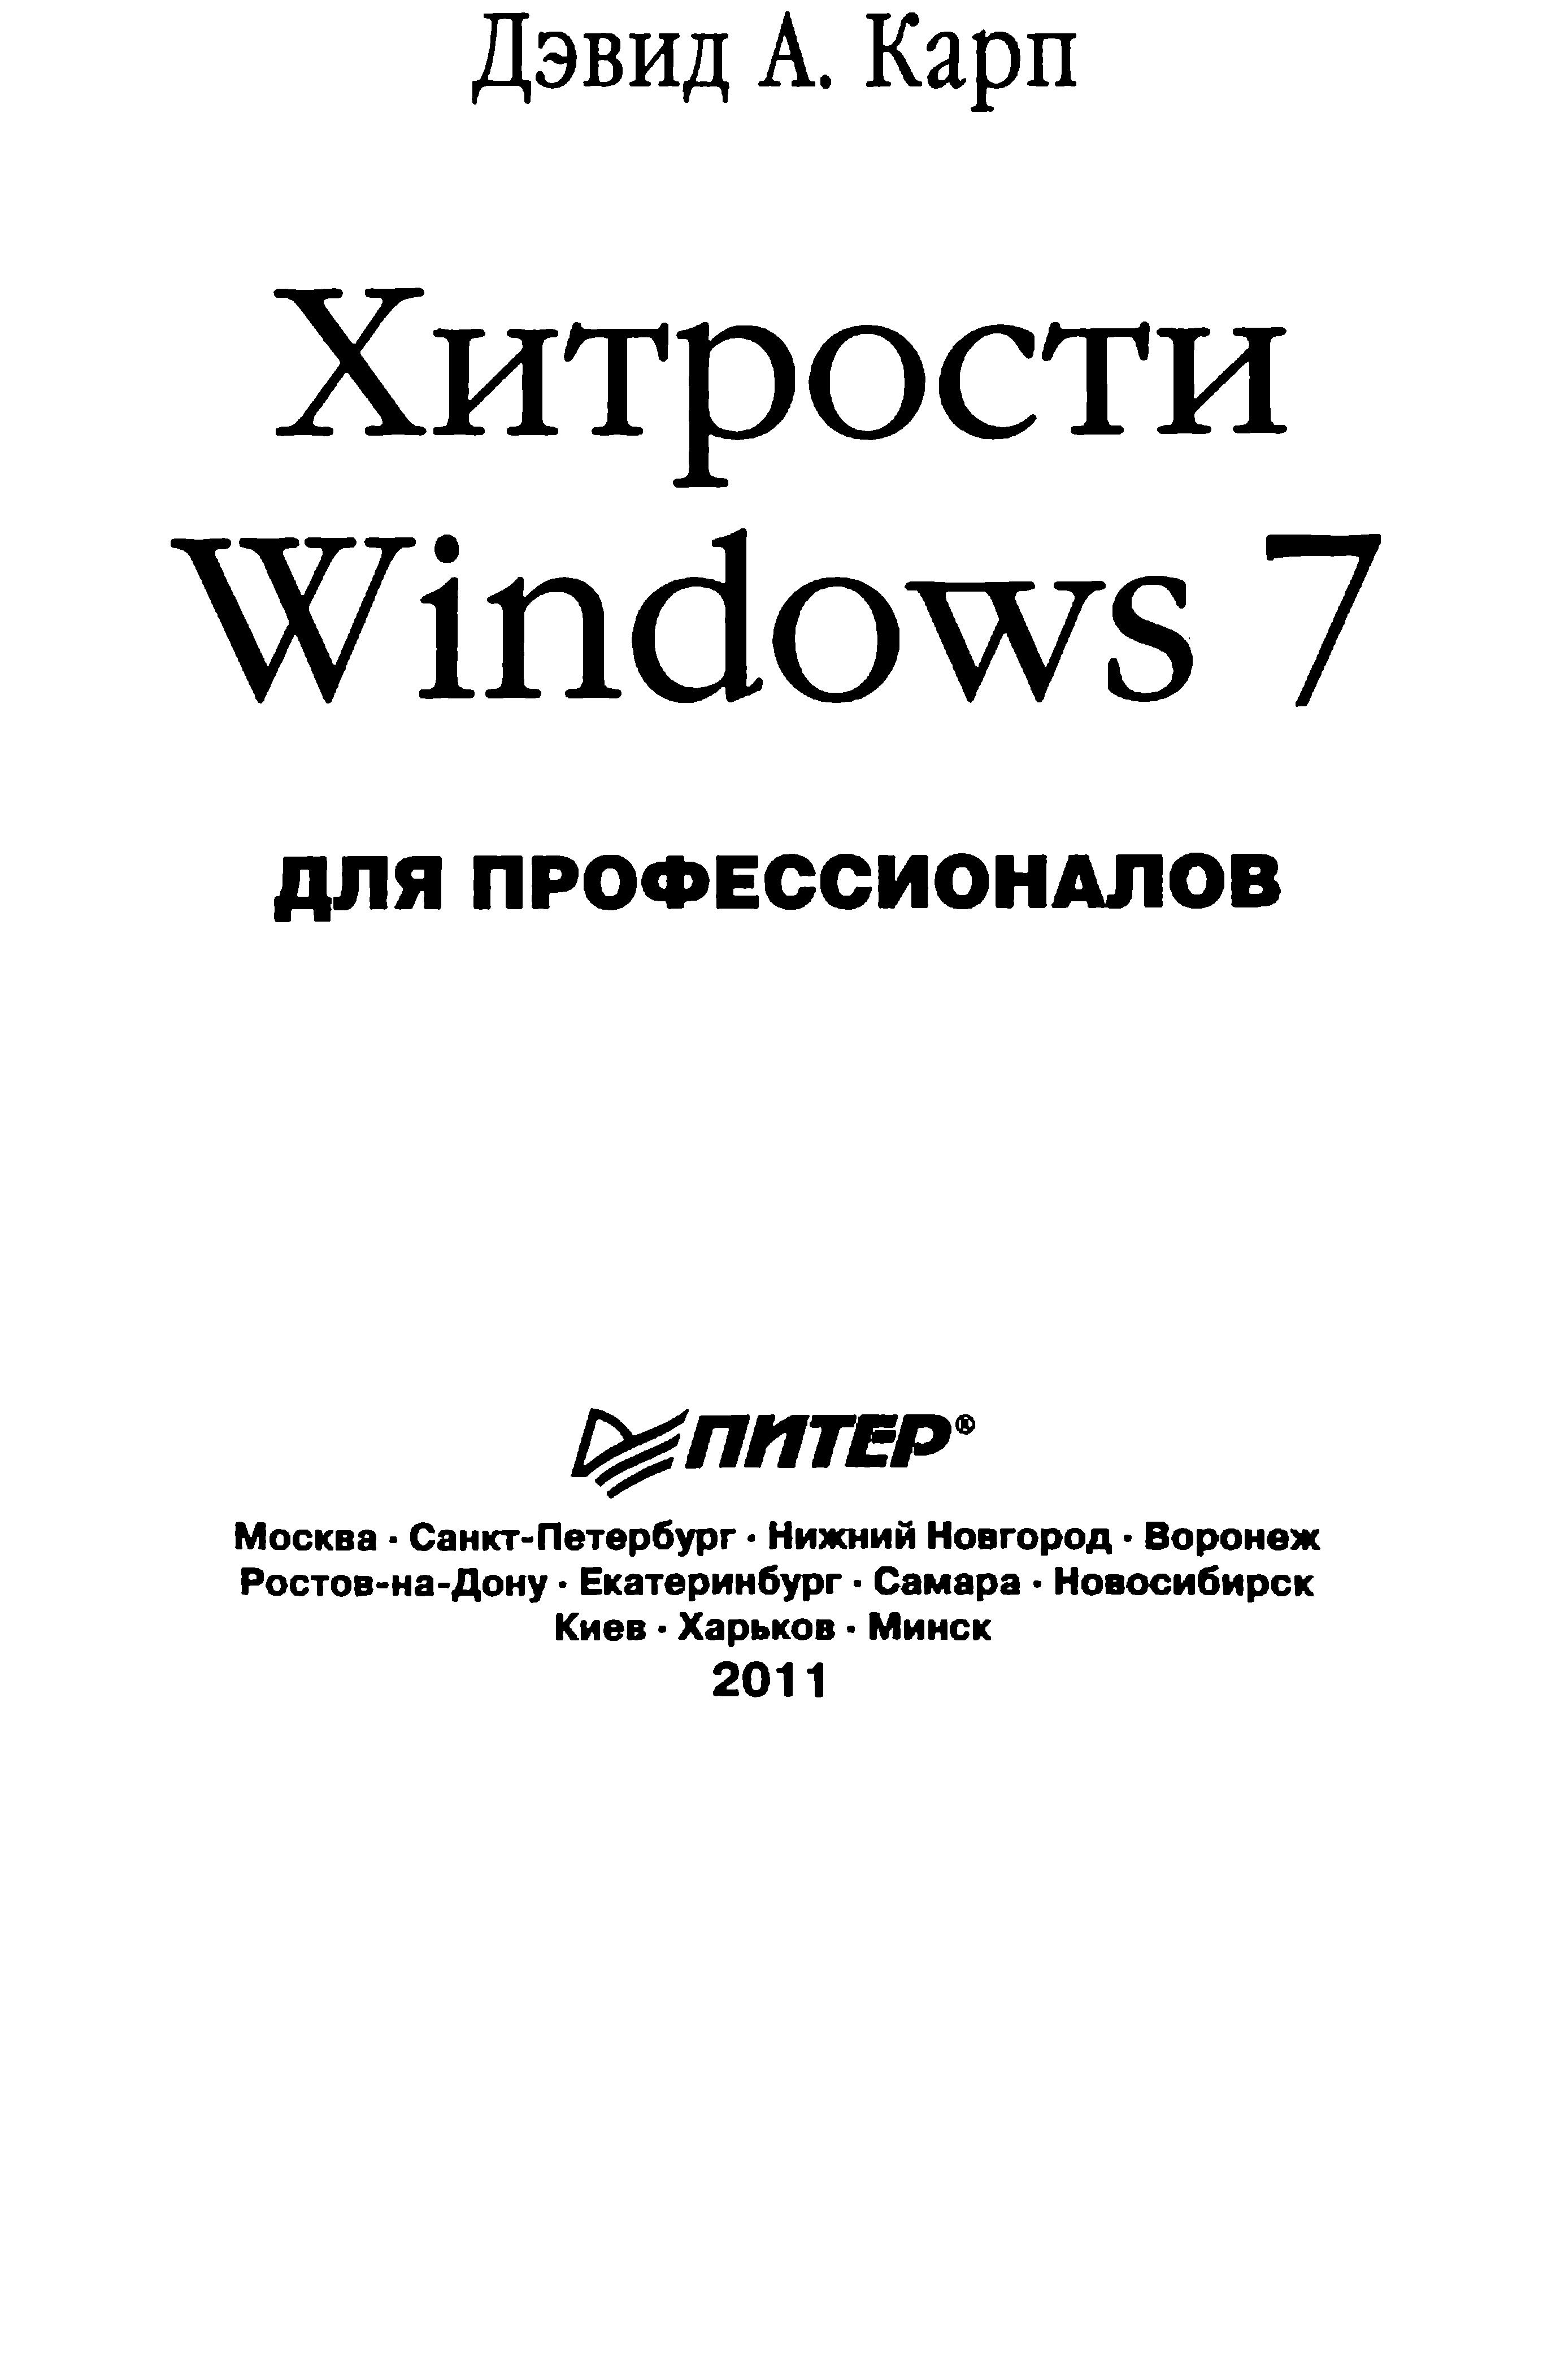 Программа презентации на windows 7 и установить